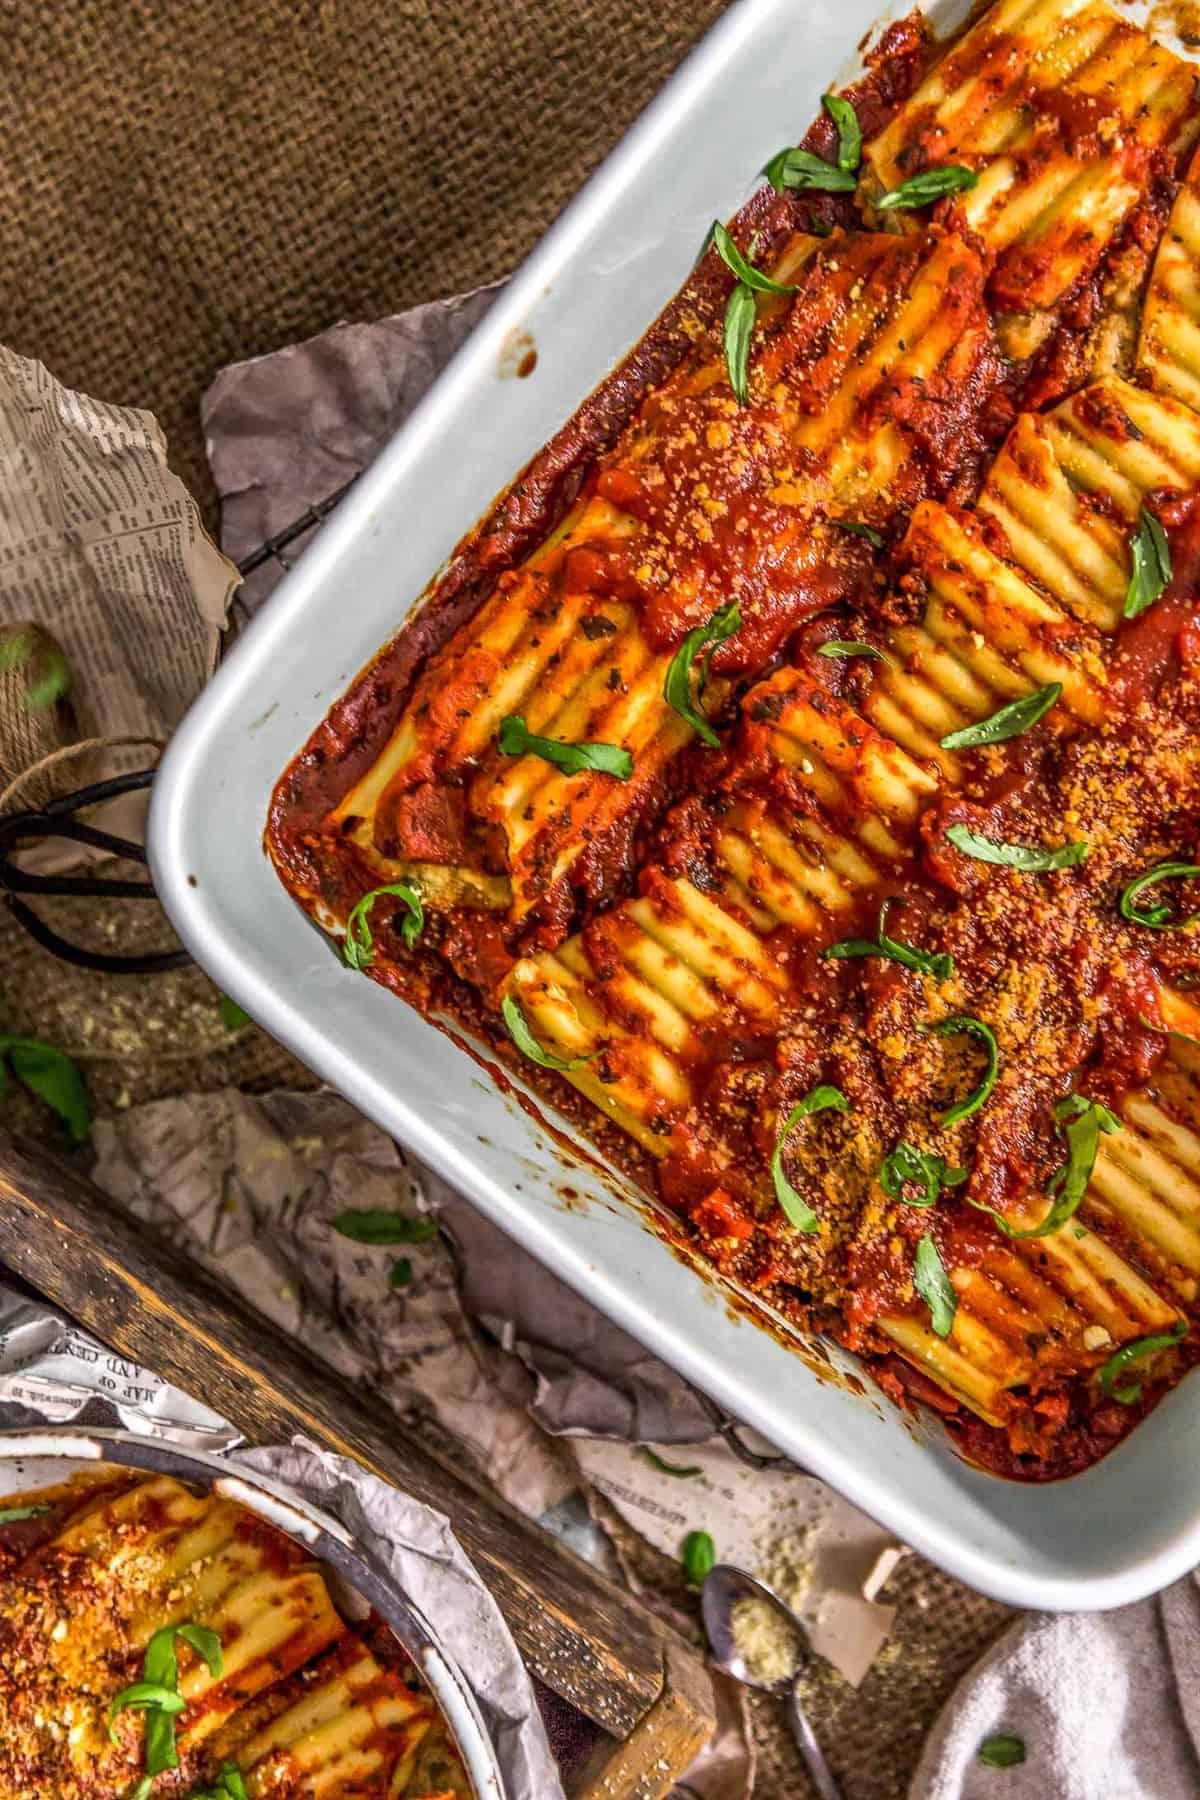 Vegan Manicotti Stuffed with Cauliflower Cream and Spinach